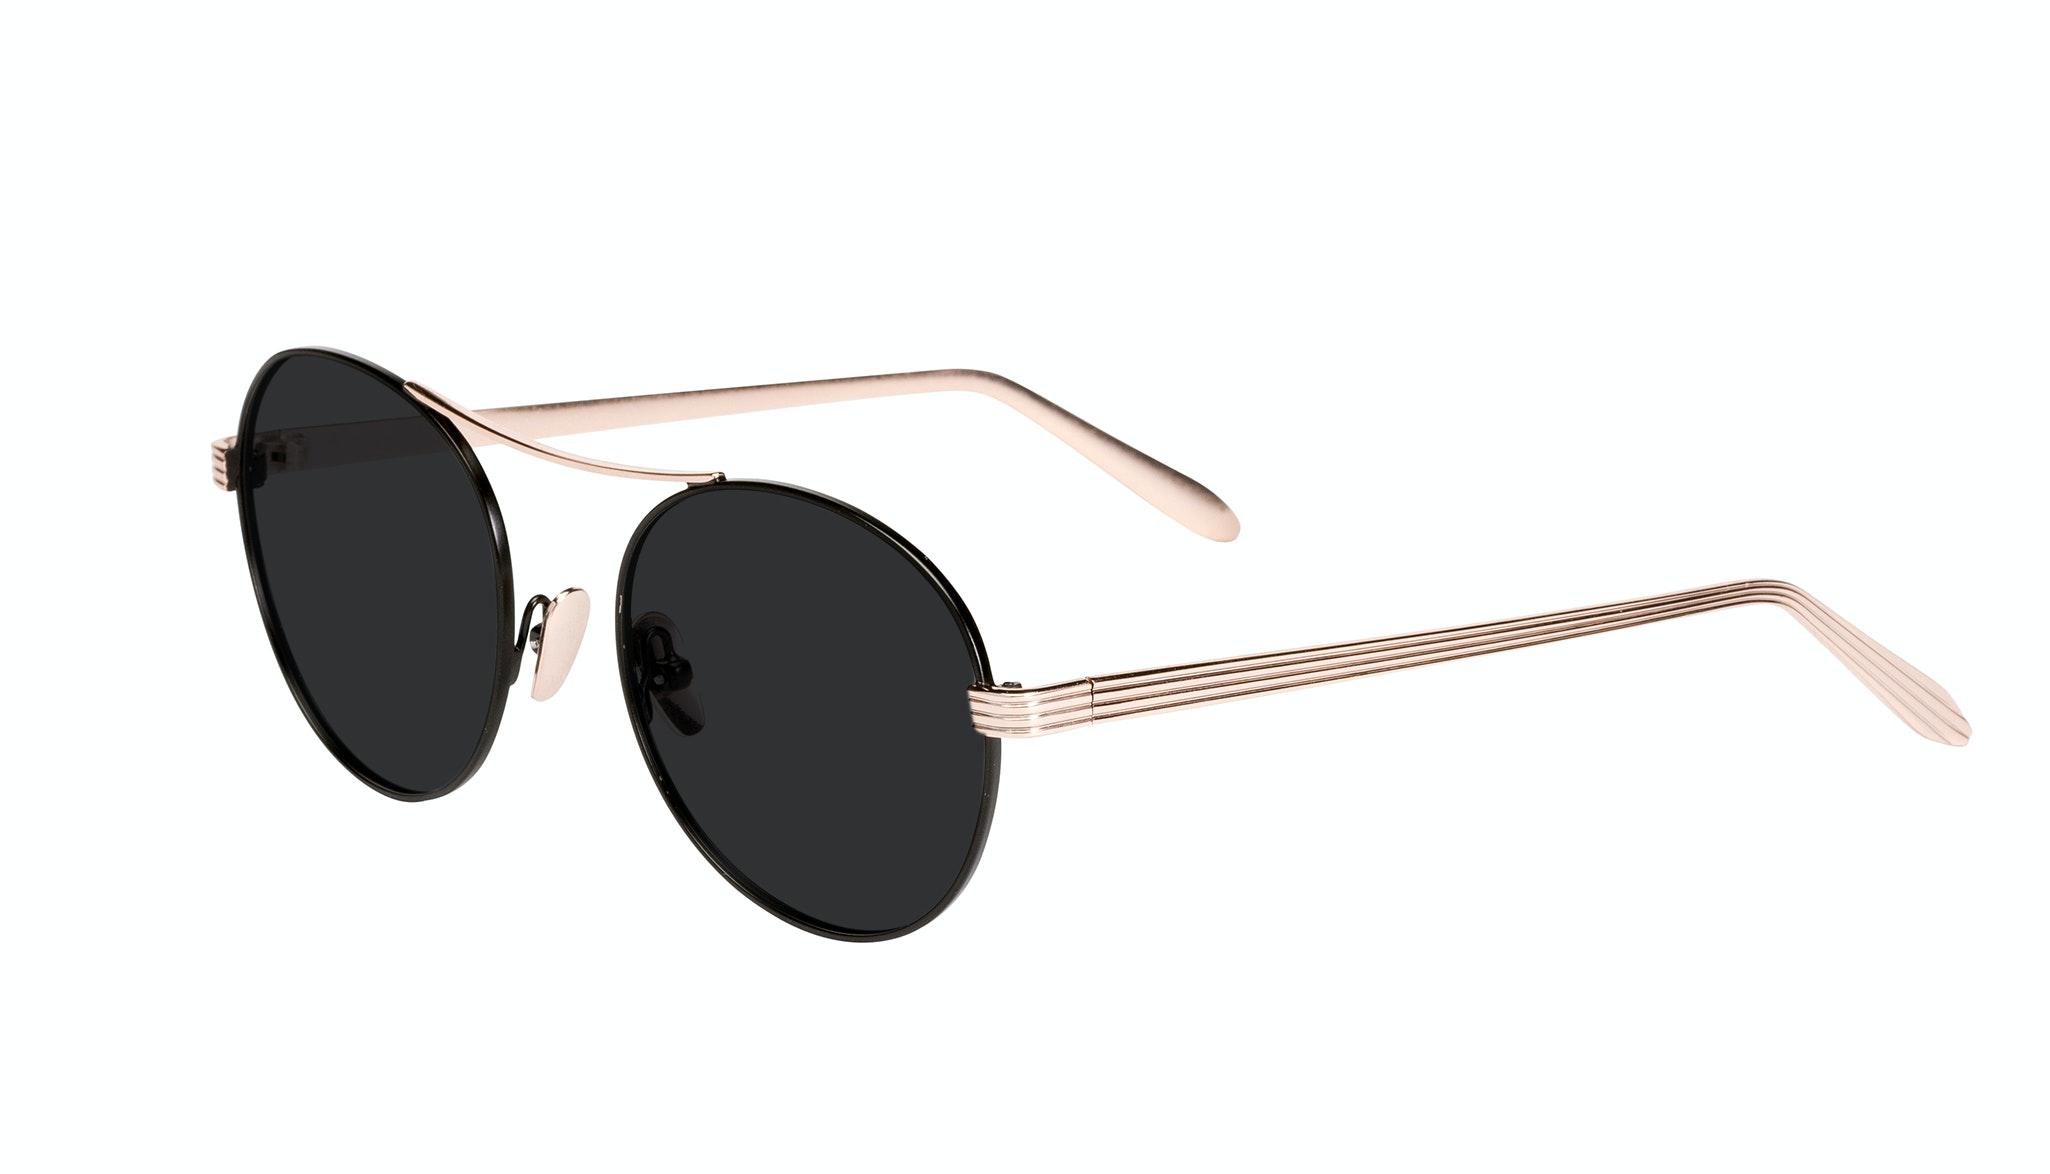 Affordable Fashion Glasses Round Sunglasses Women Prize Deep Gold Tilt